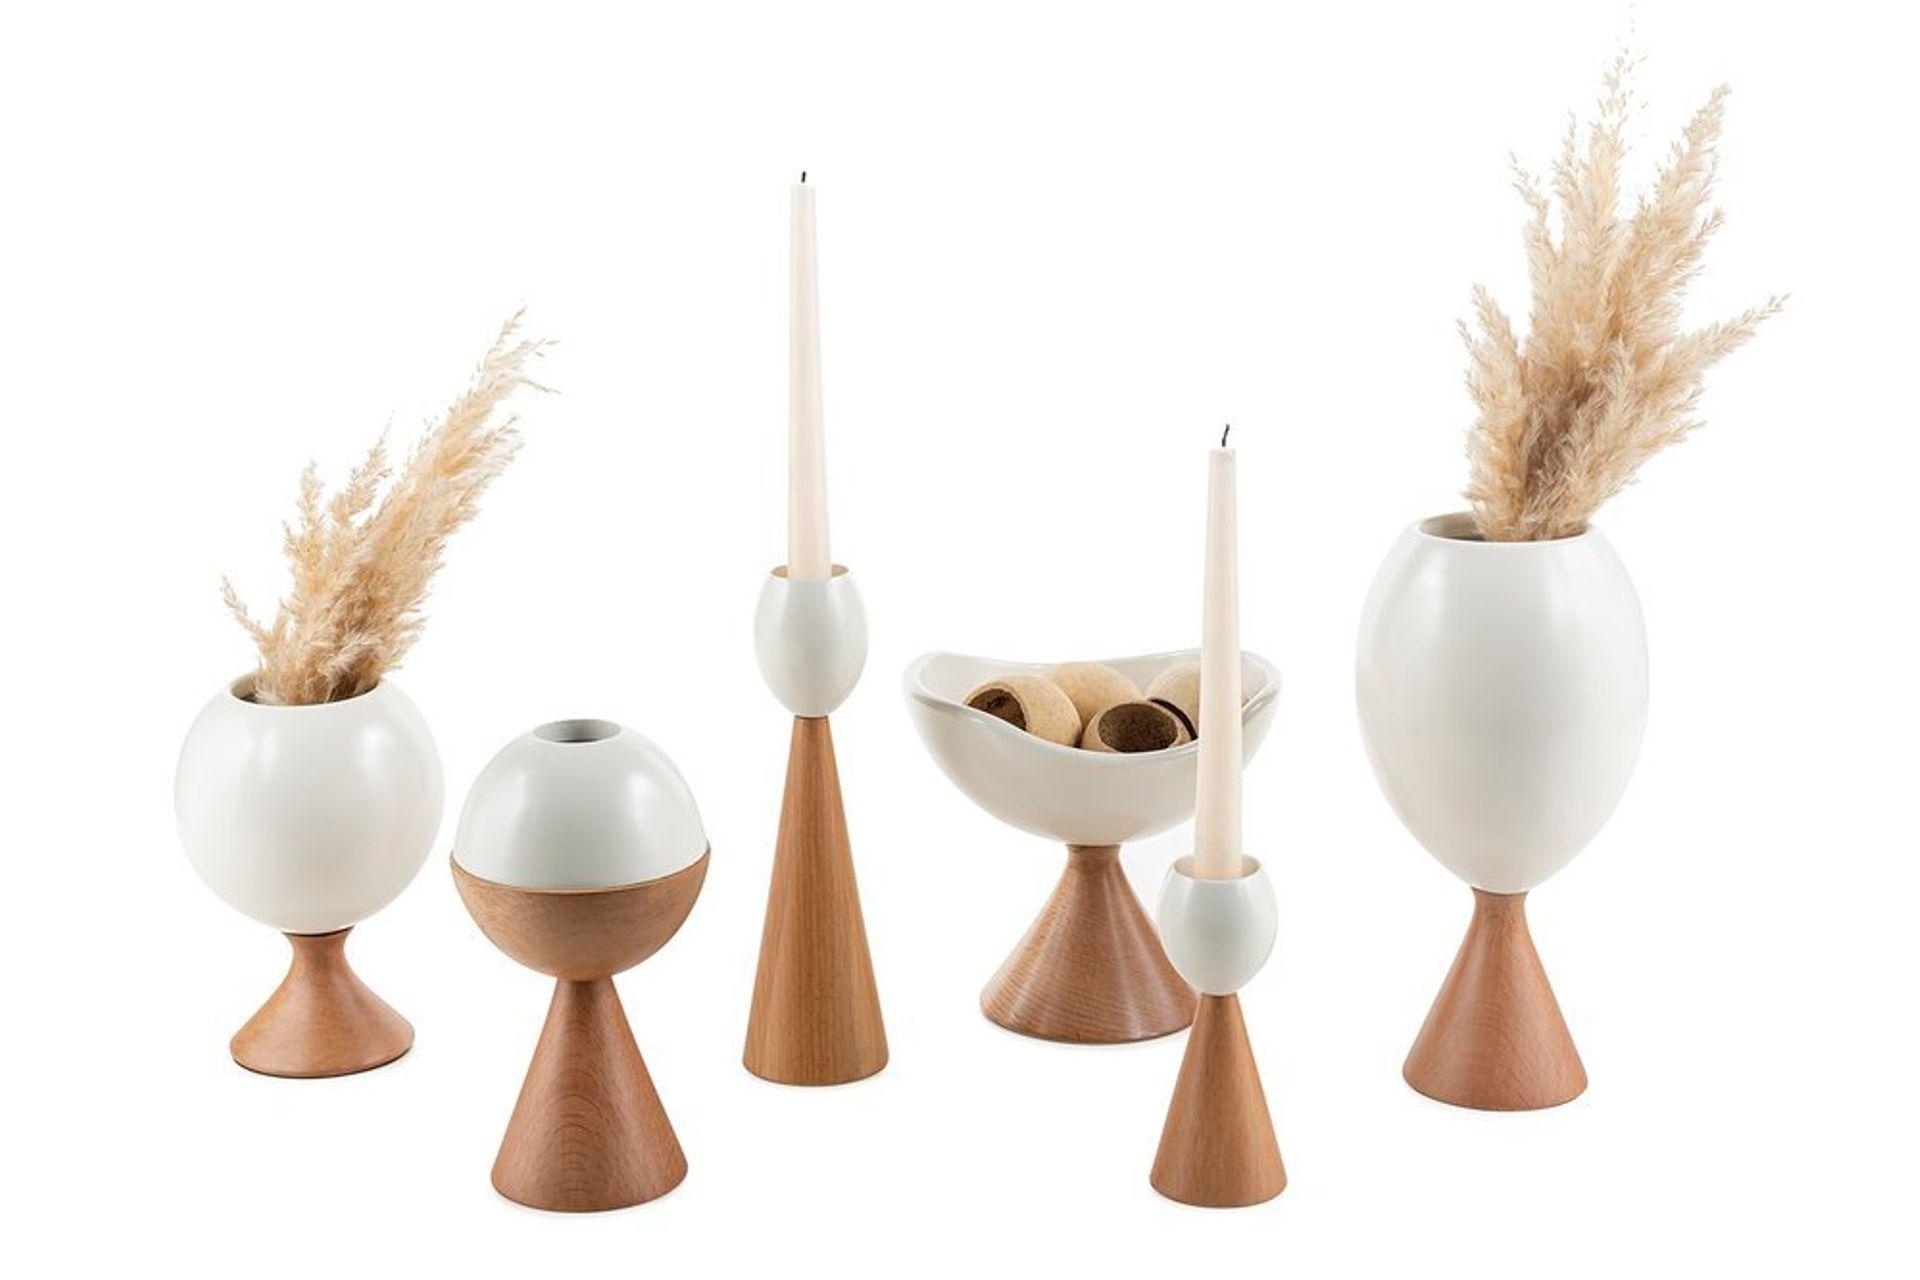 Egg Decorative Object